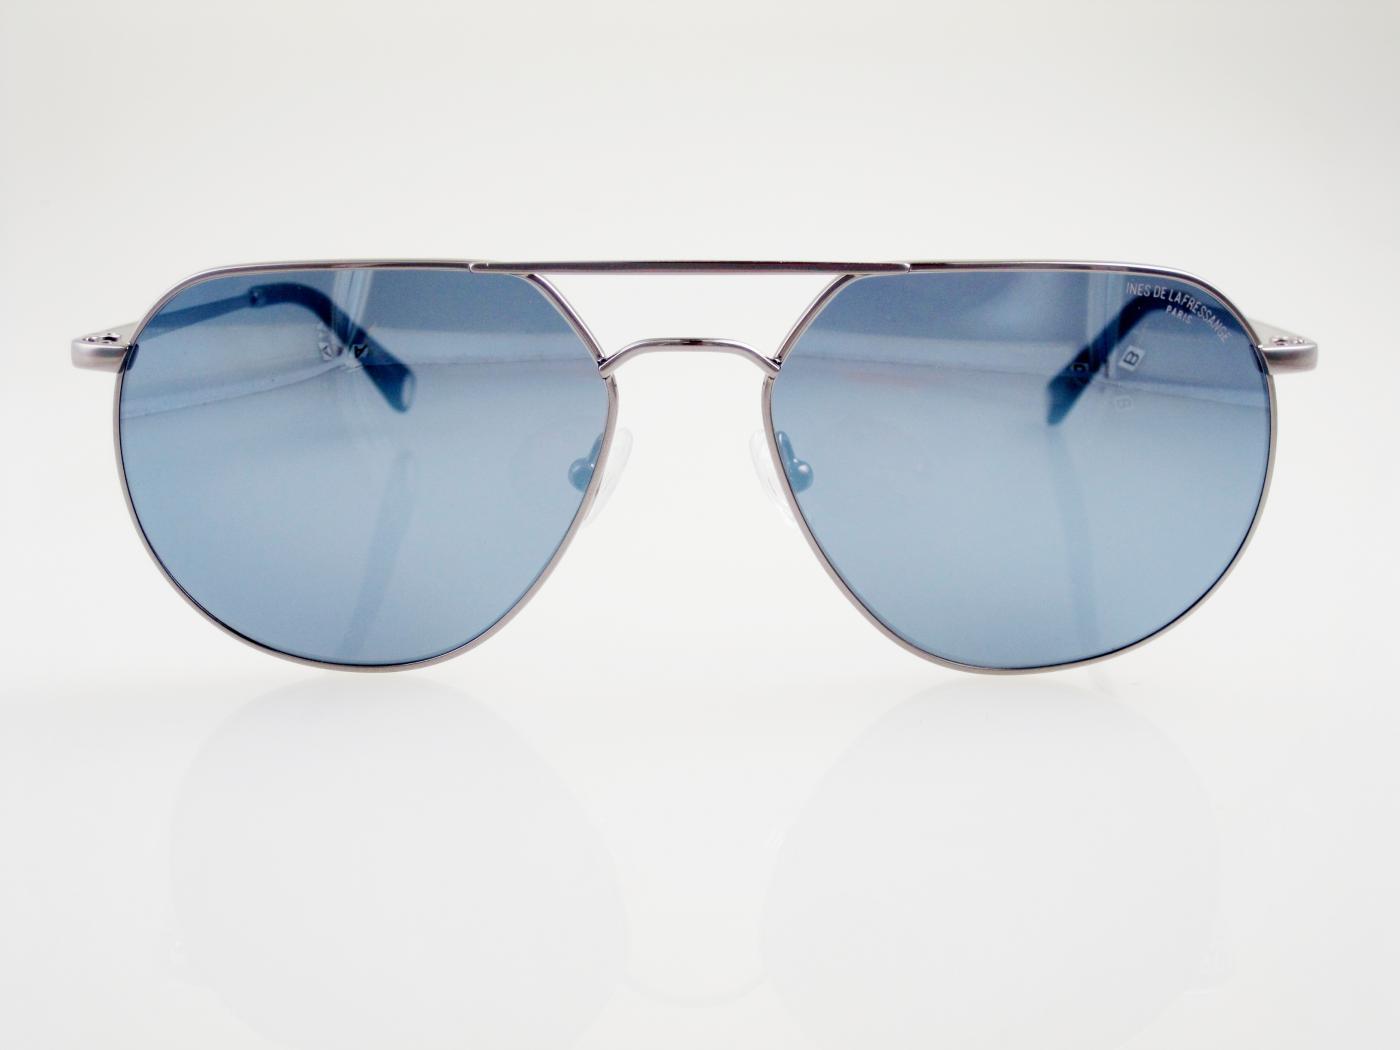 1b9a11ee5 Unisex slnečné okuliare Ines de la Fressange   oftalens.sk